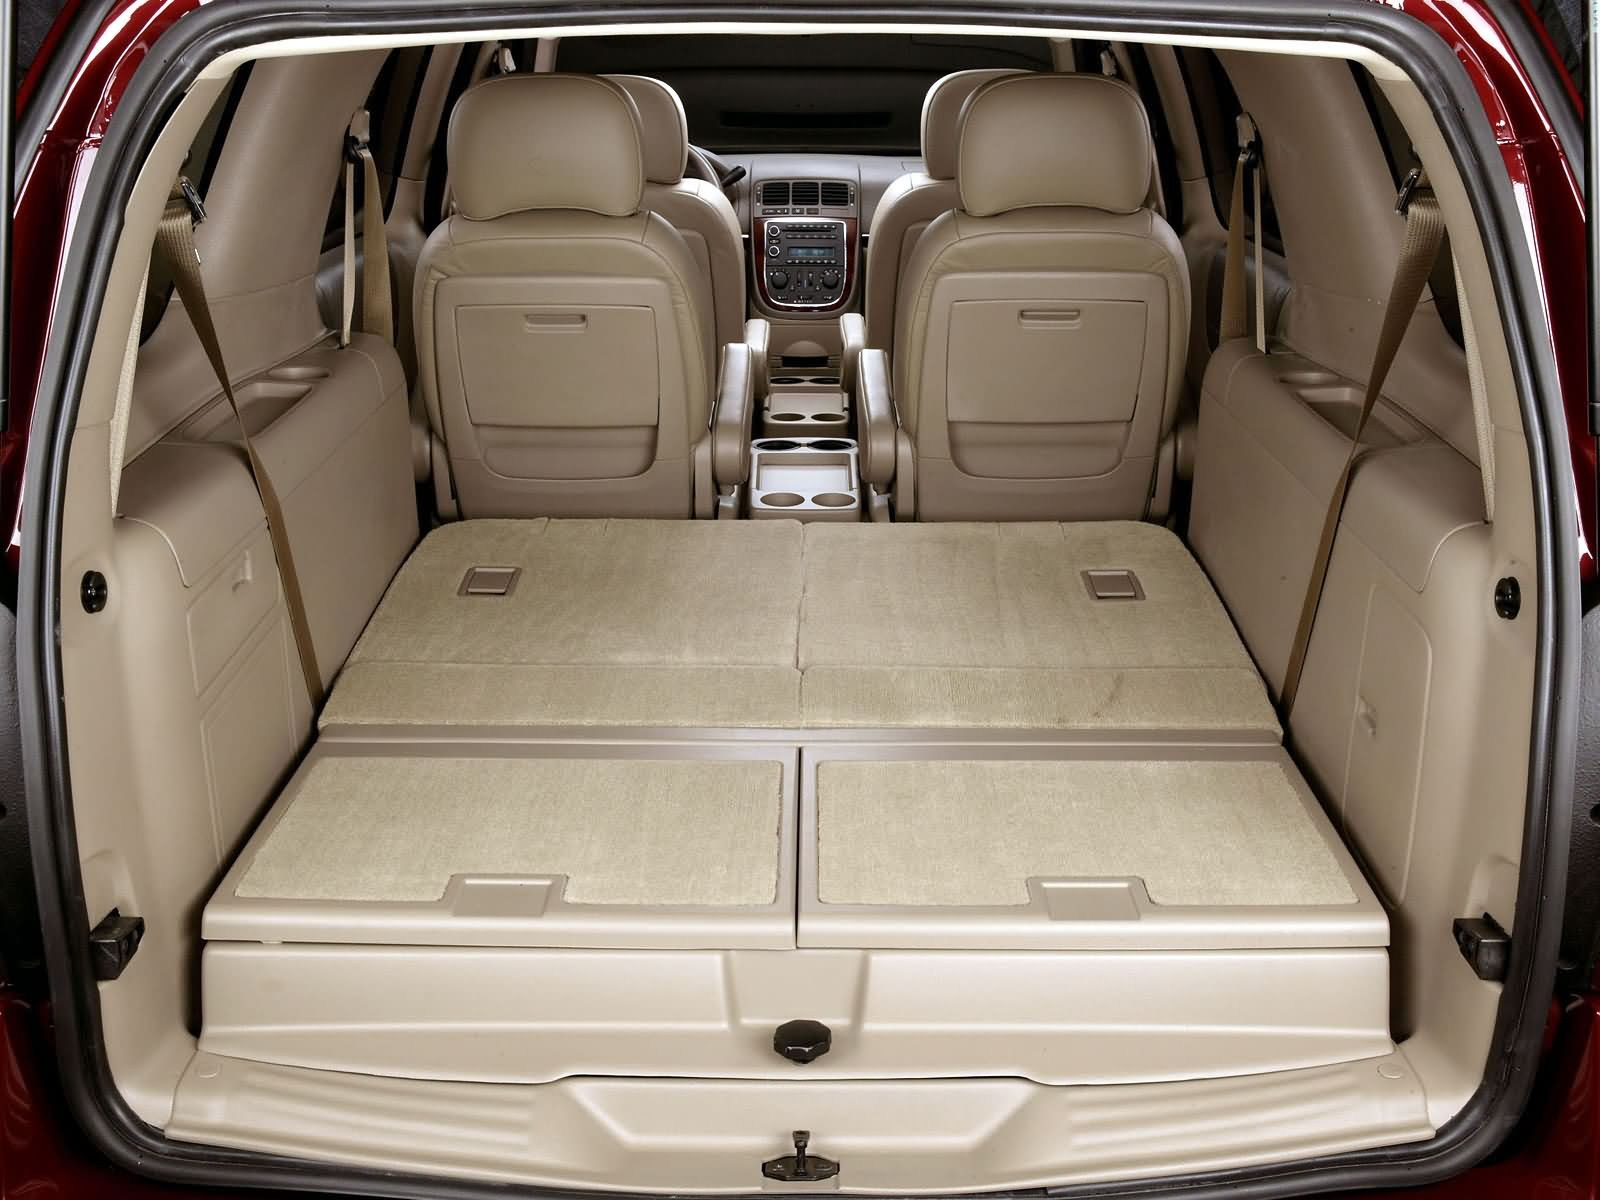 Buick Terraza CXL